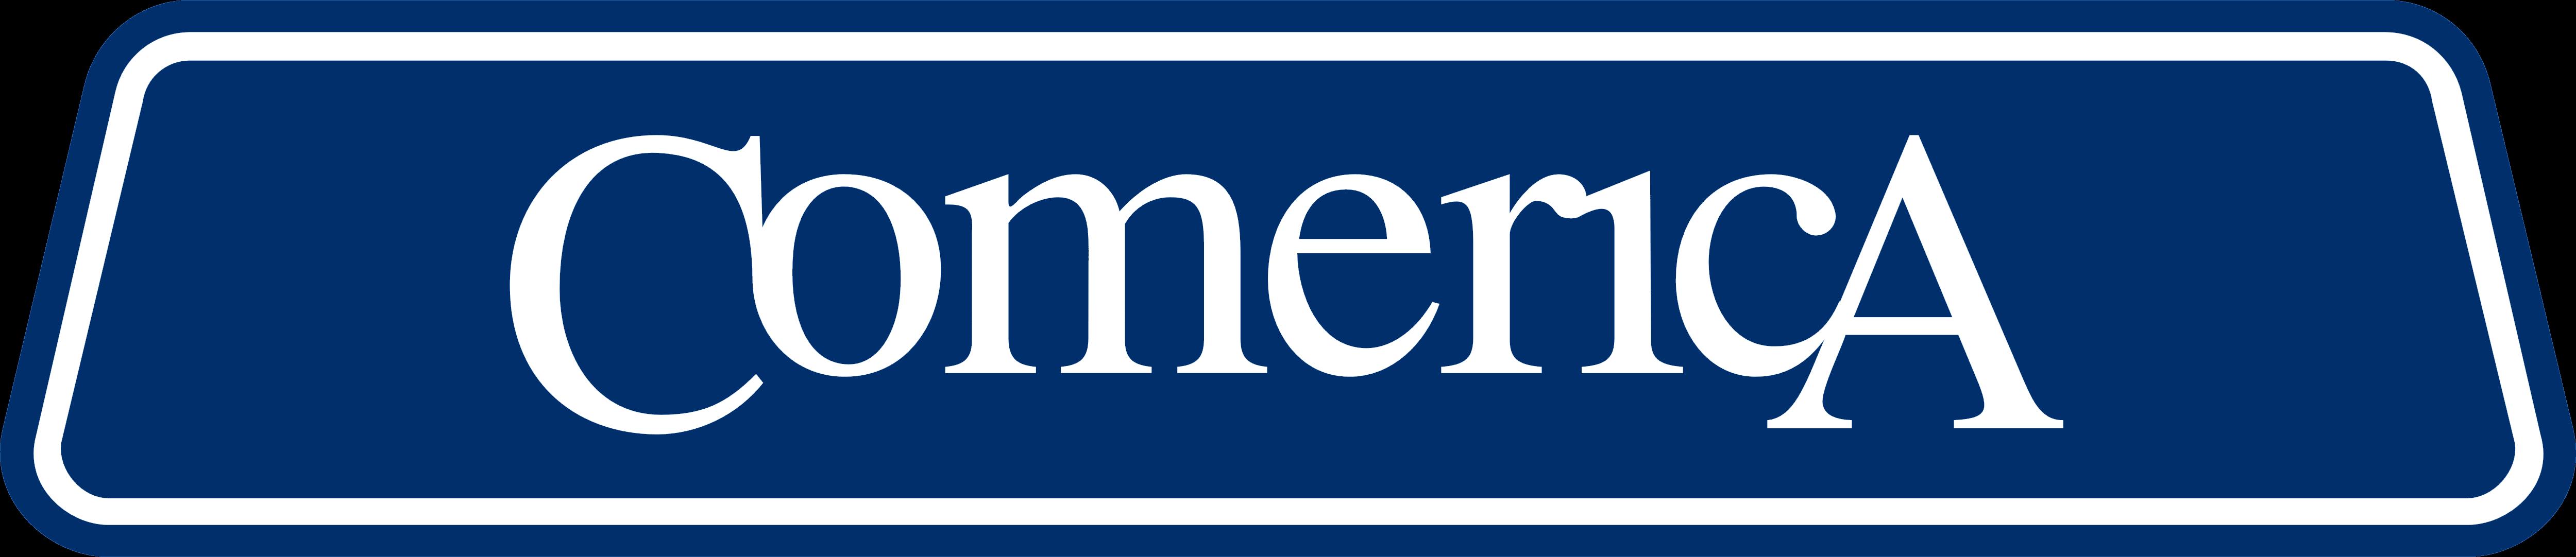 Comerica Bank – Logos Download